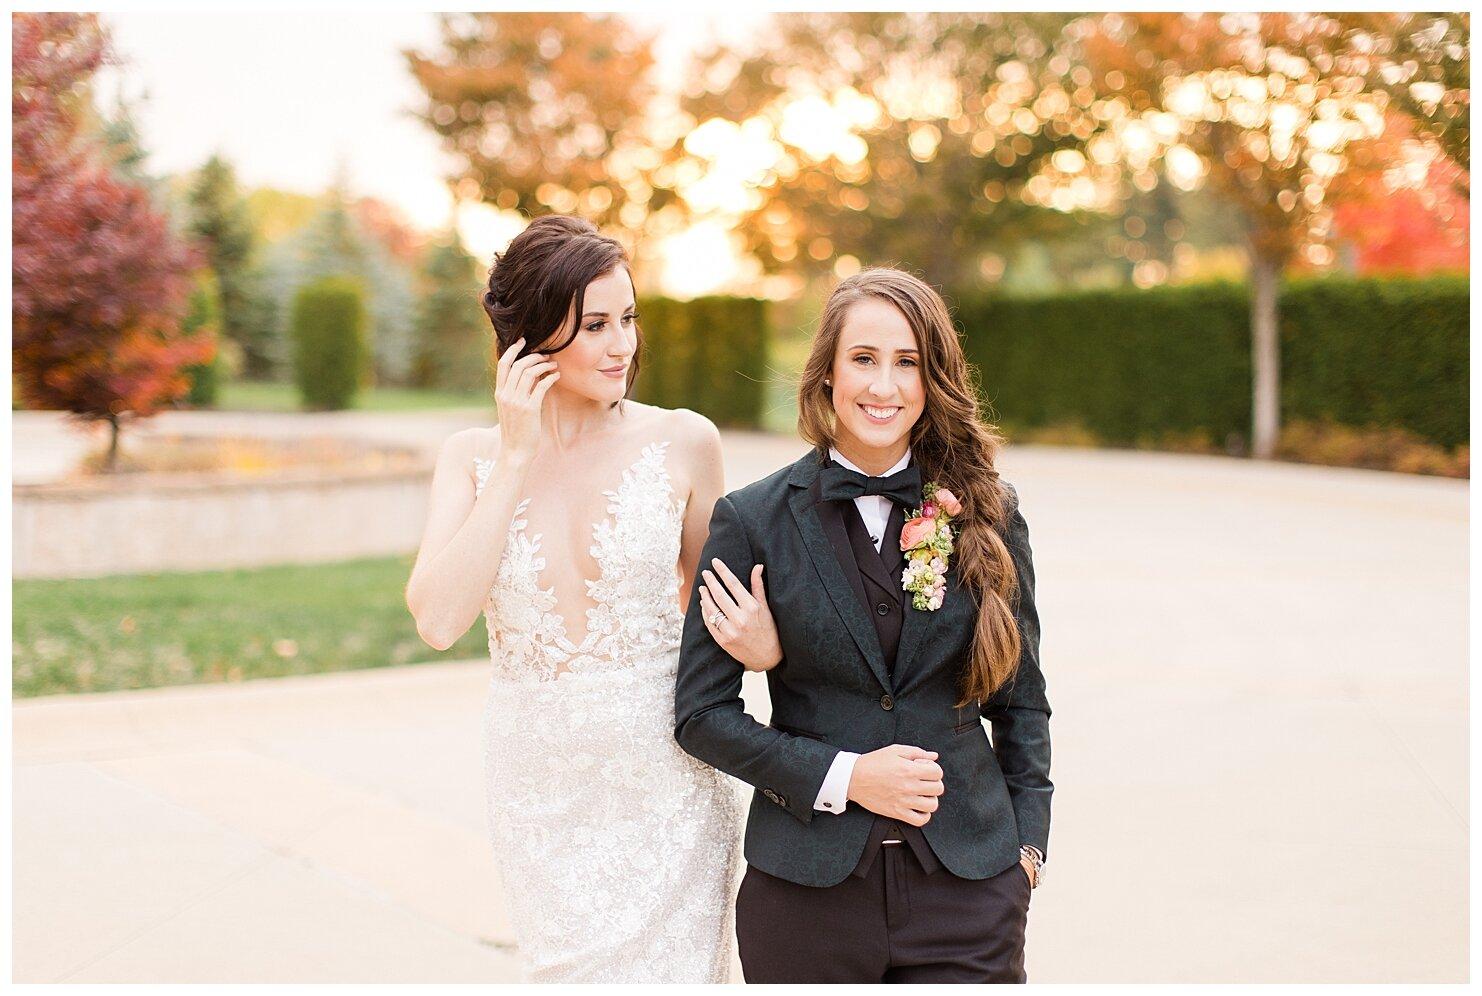 club-corazon-columbus-wedding-photography_0057.jpg